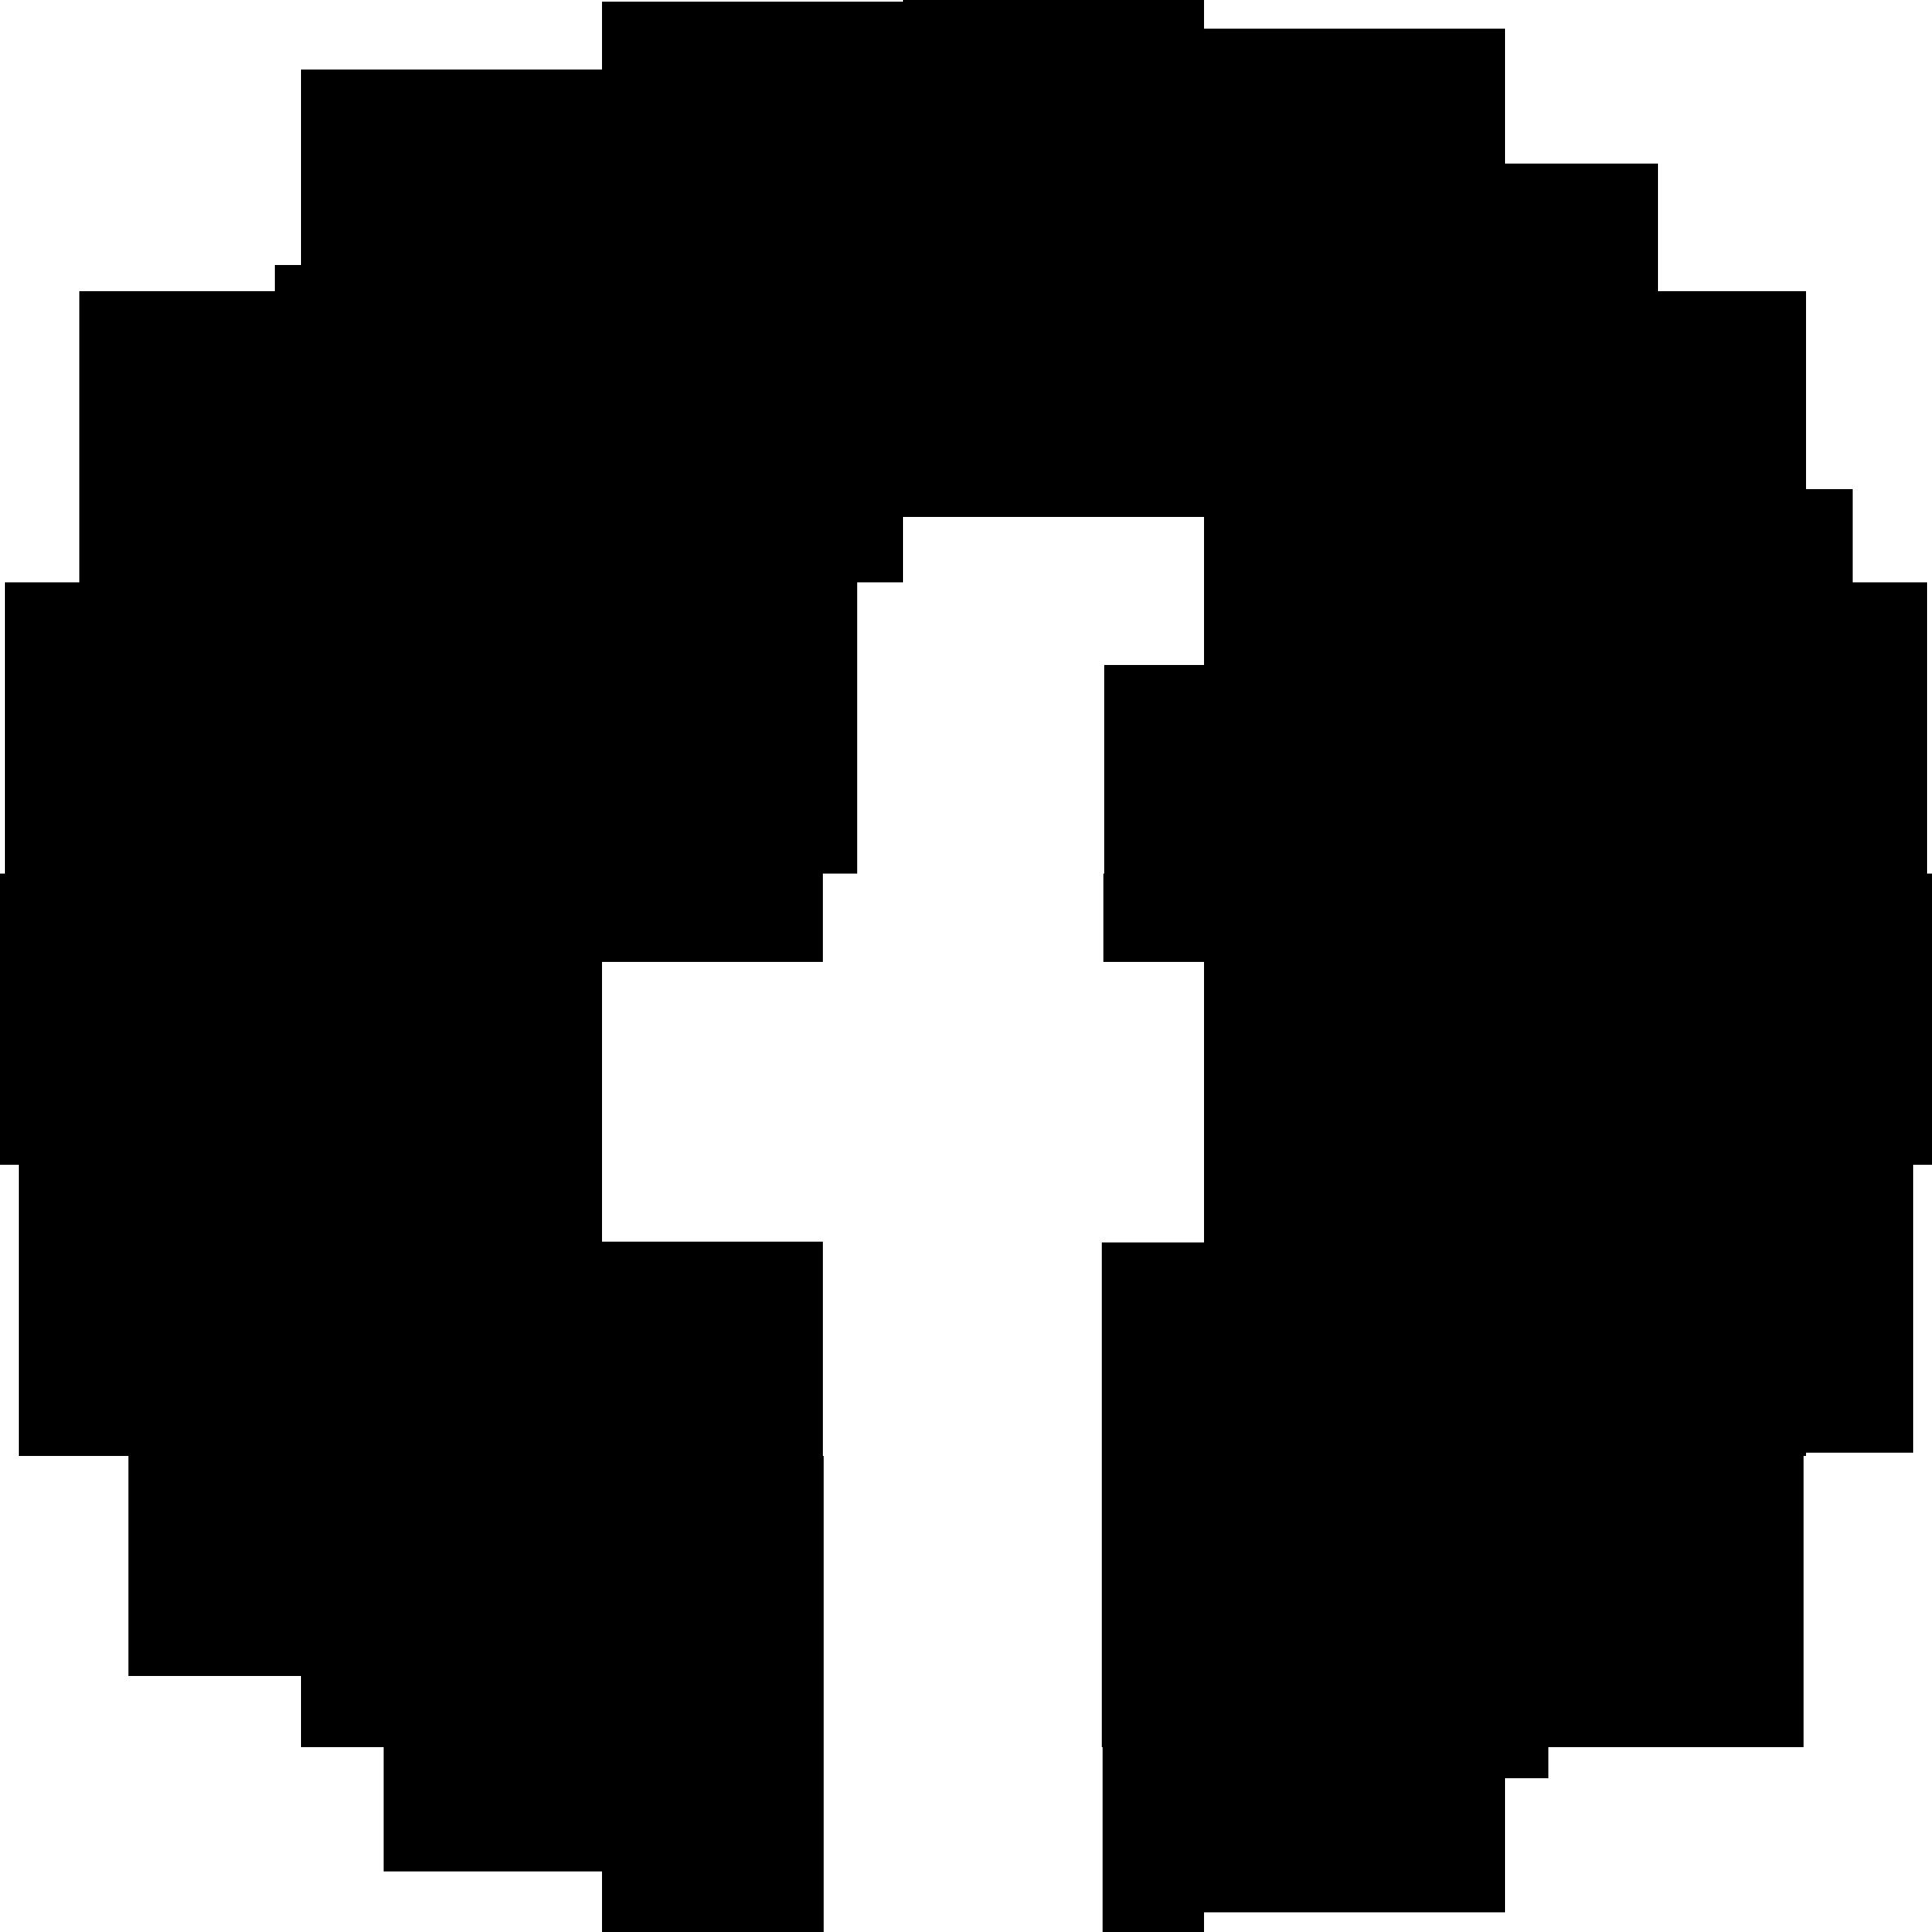 Free Black Cercle Facebook Logo Png